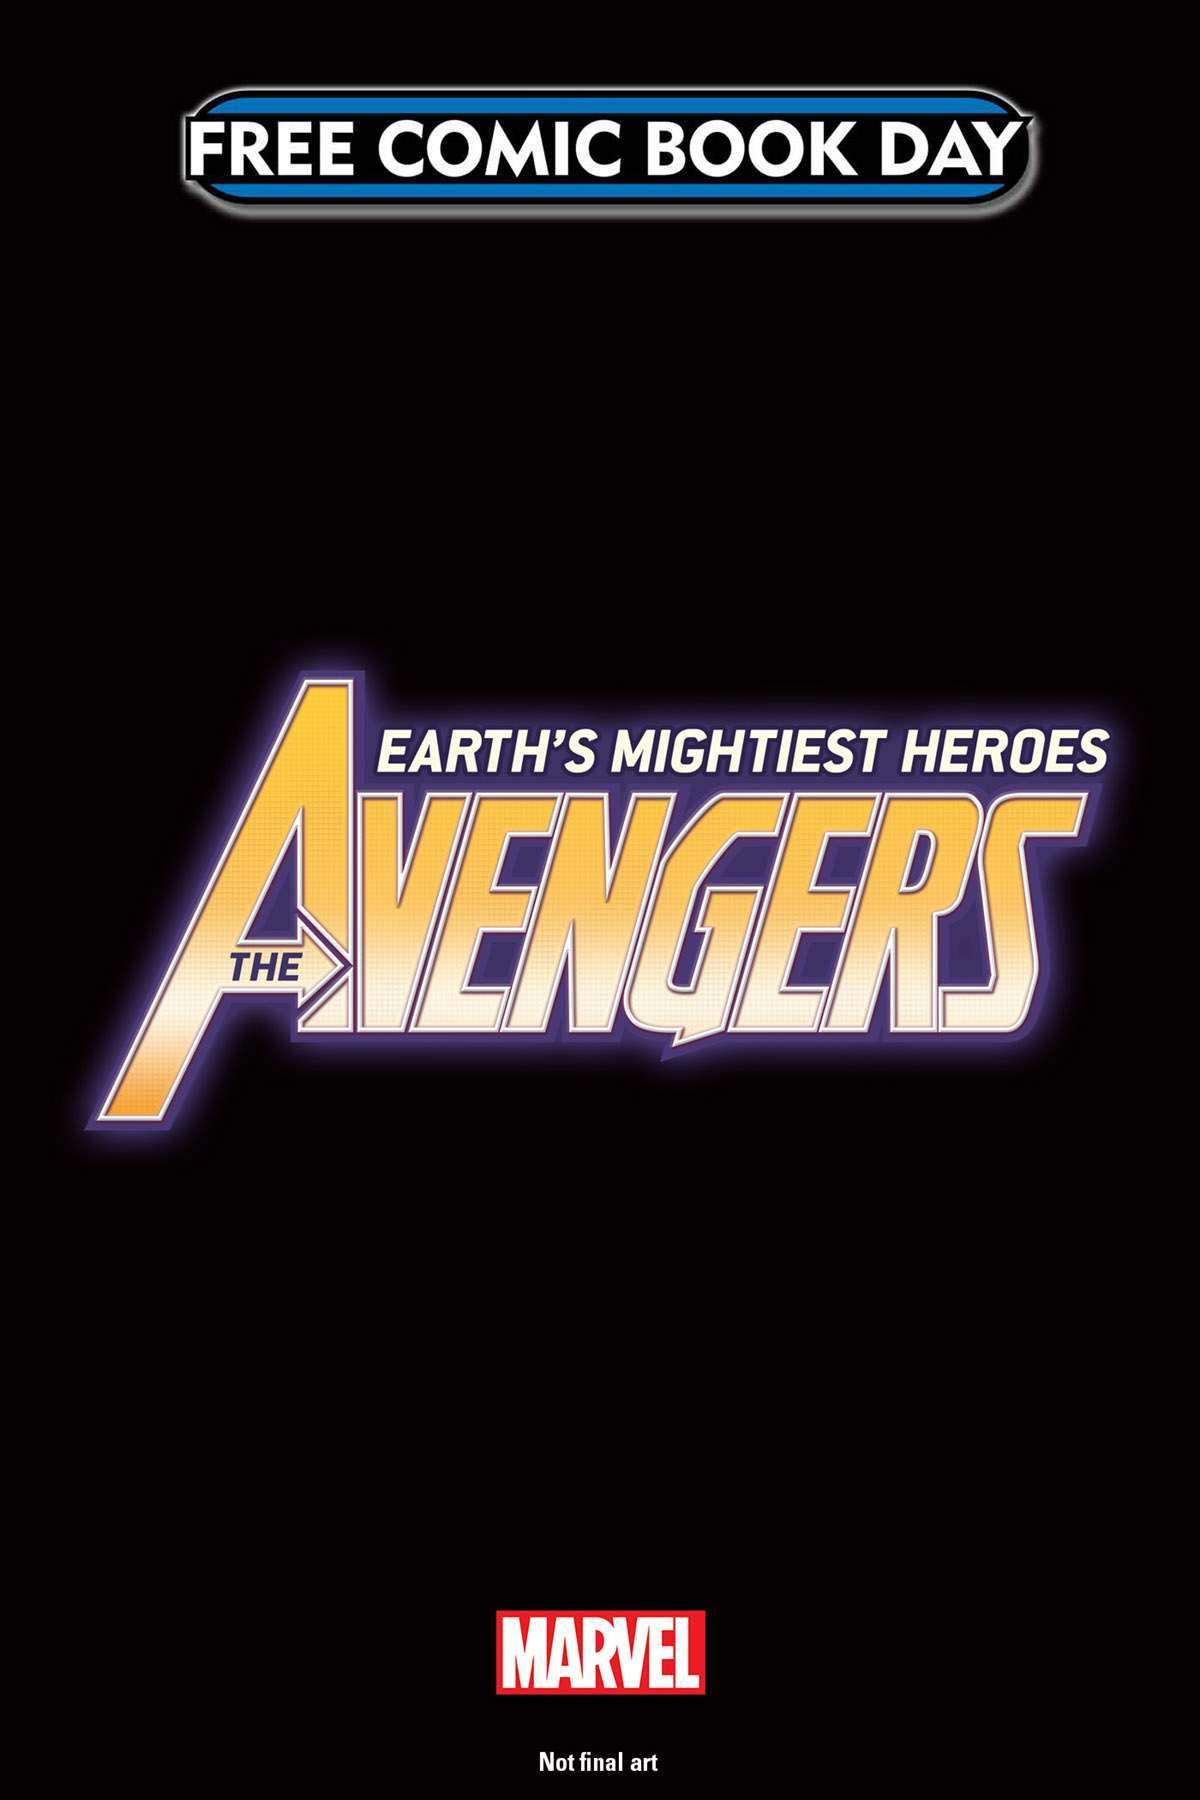 FCBD19_G_Marvel Comics_The Avengers